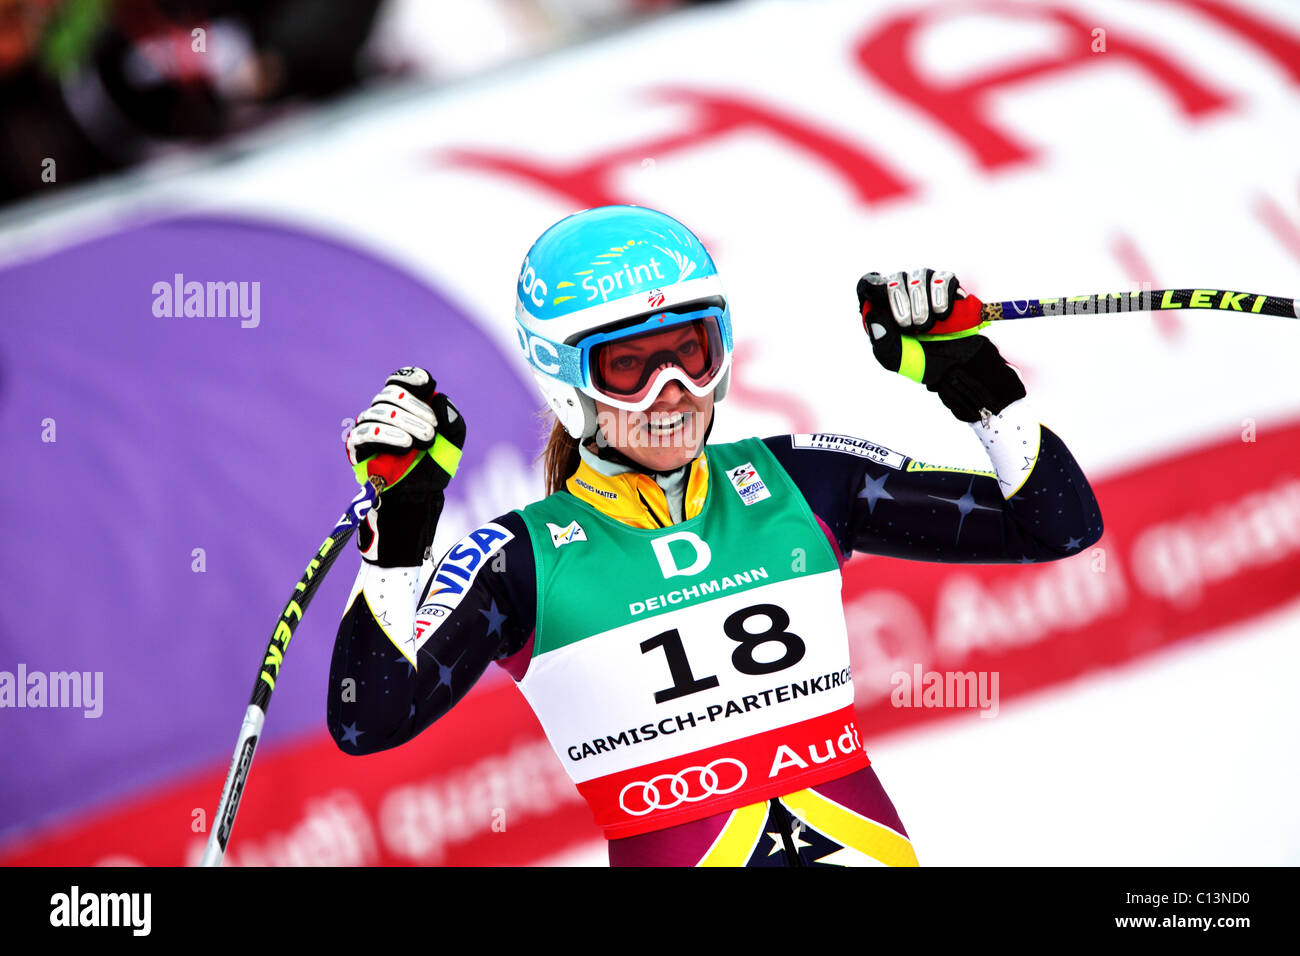 Julia Mancuso (USA) at the FIS Alpine World Ski Championships 2011 in Garmisch-Partenkirchen - Stock Image